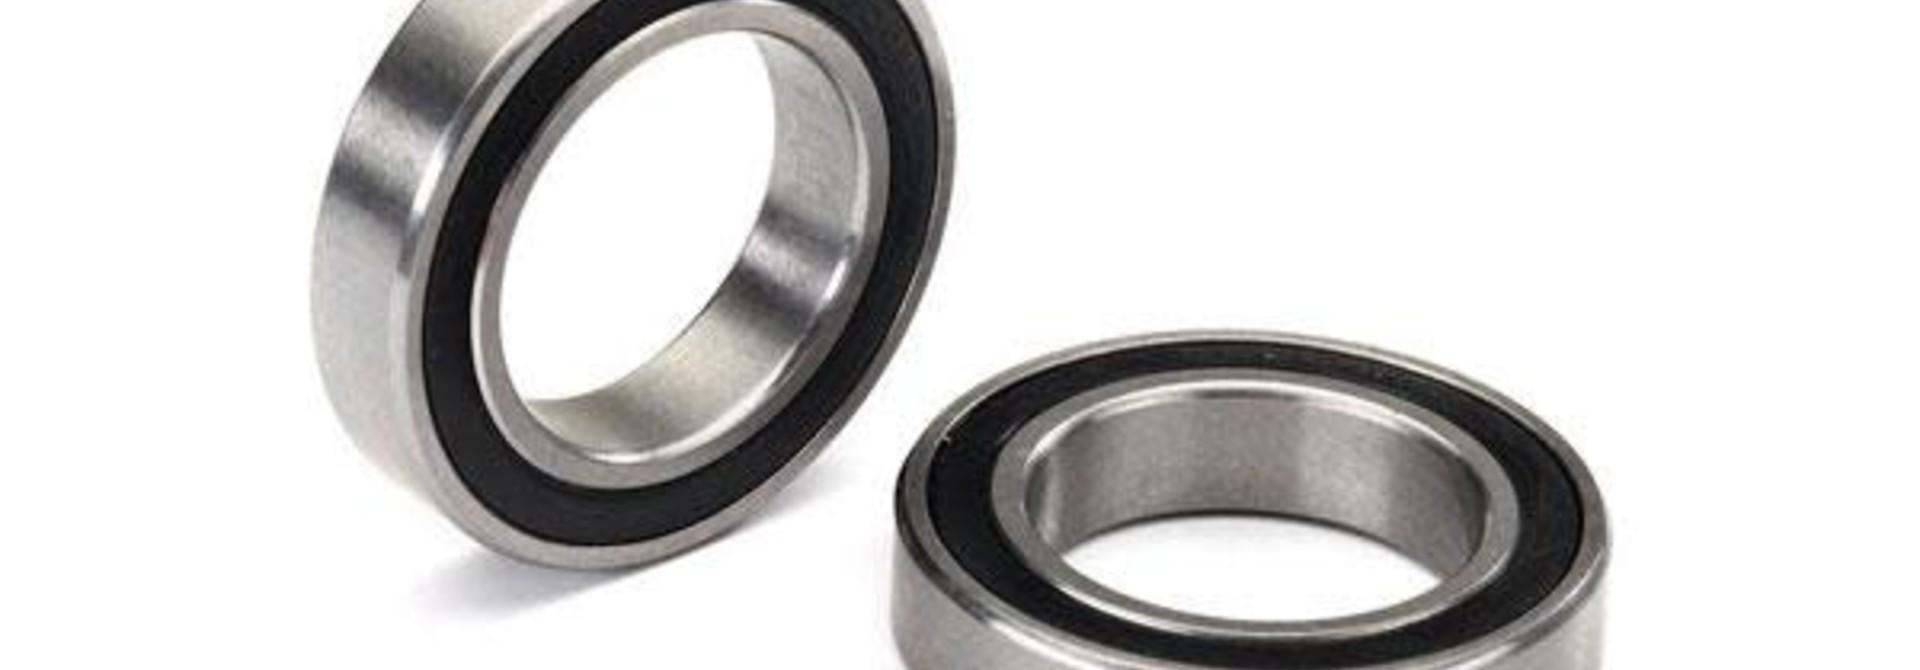 Ball bearing, black rubber sealed (20x32x7mm) (2)